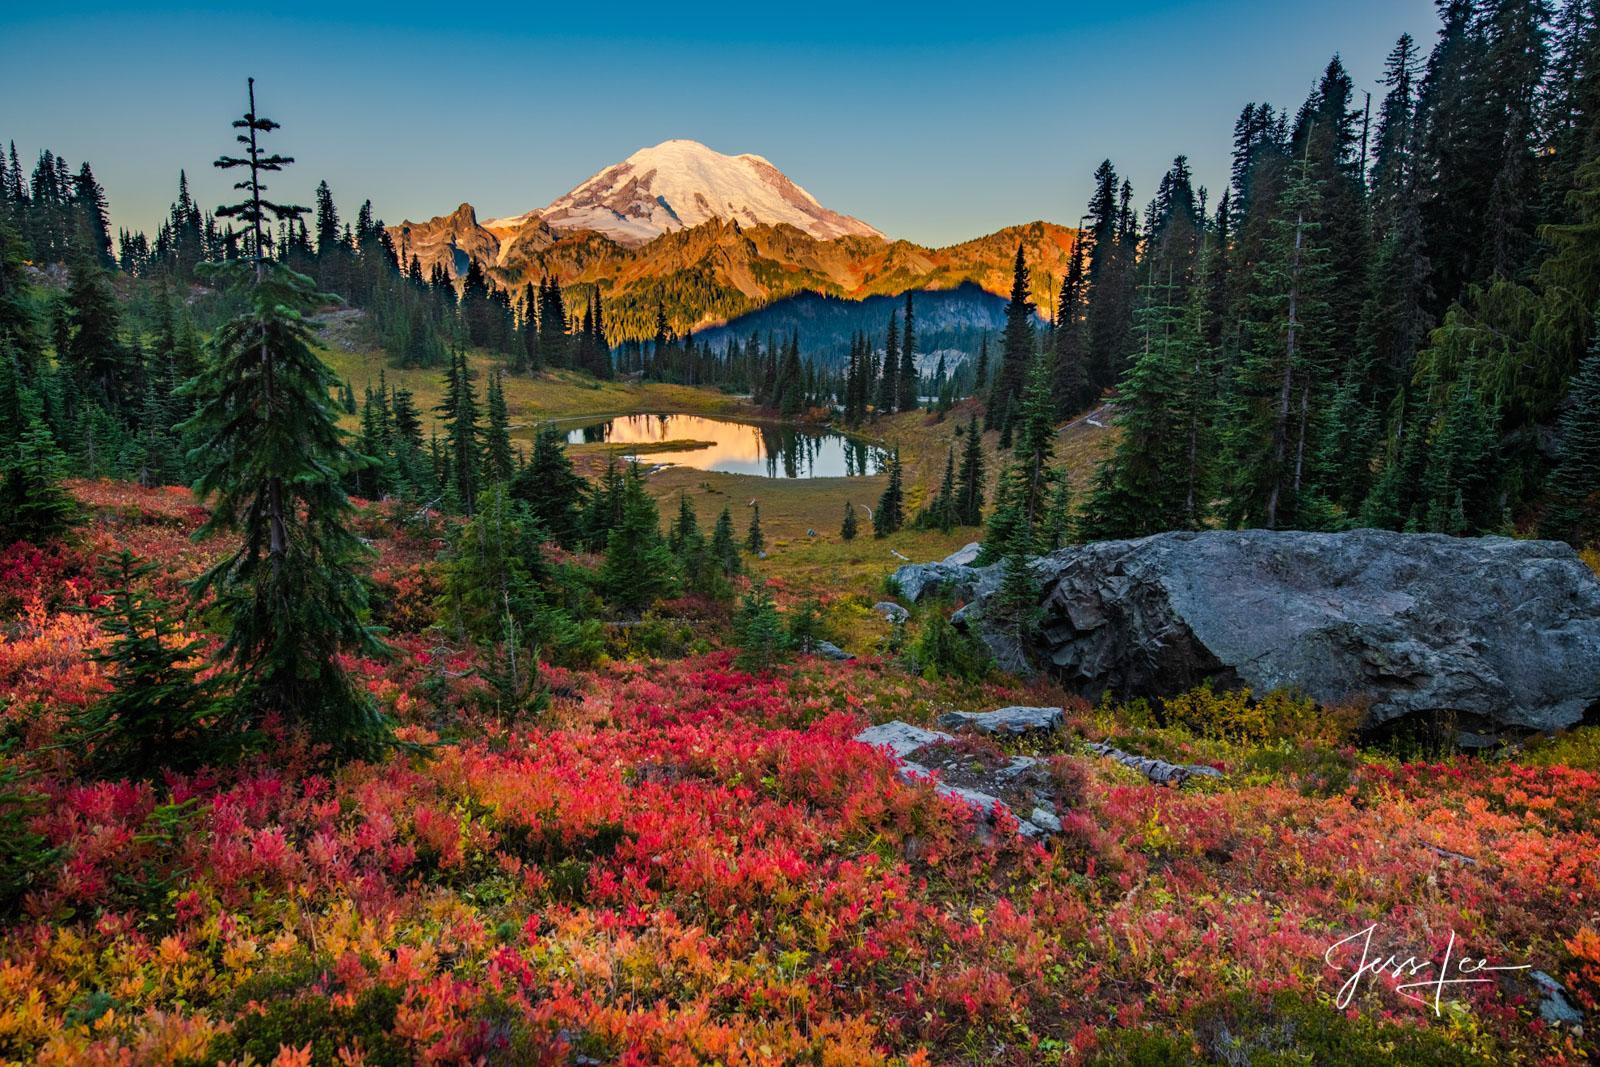 mountain photography, northwest, rainier, fall, autumn, snow-capped, beauty, fine art, , jess lee, artist, western, cowboy, photographer, limited edition, high quality, high resolution, beautiful, art, photo